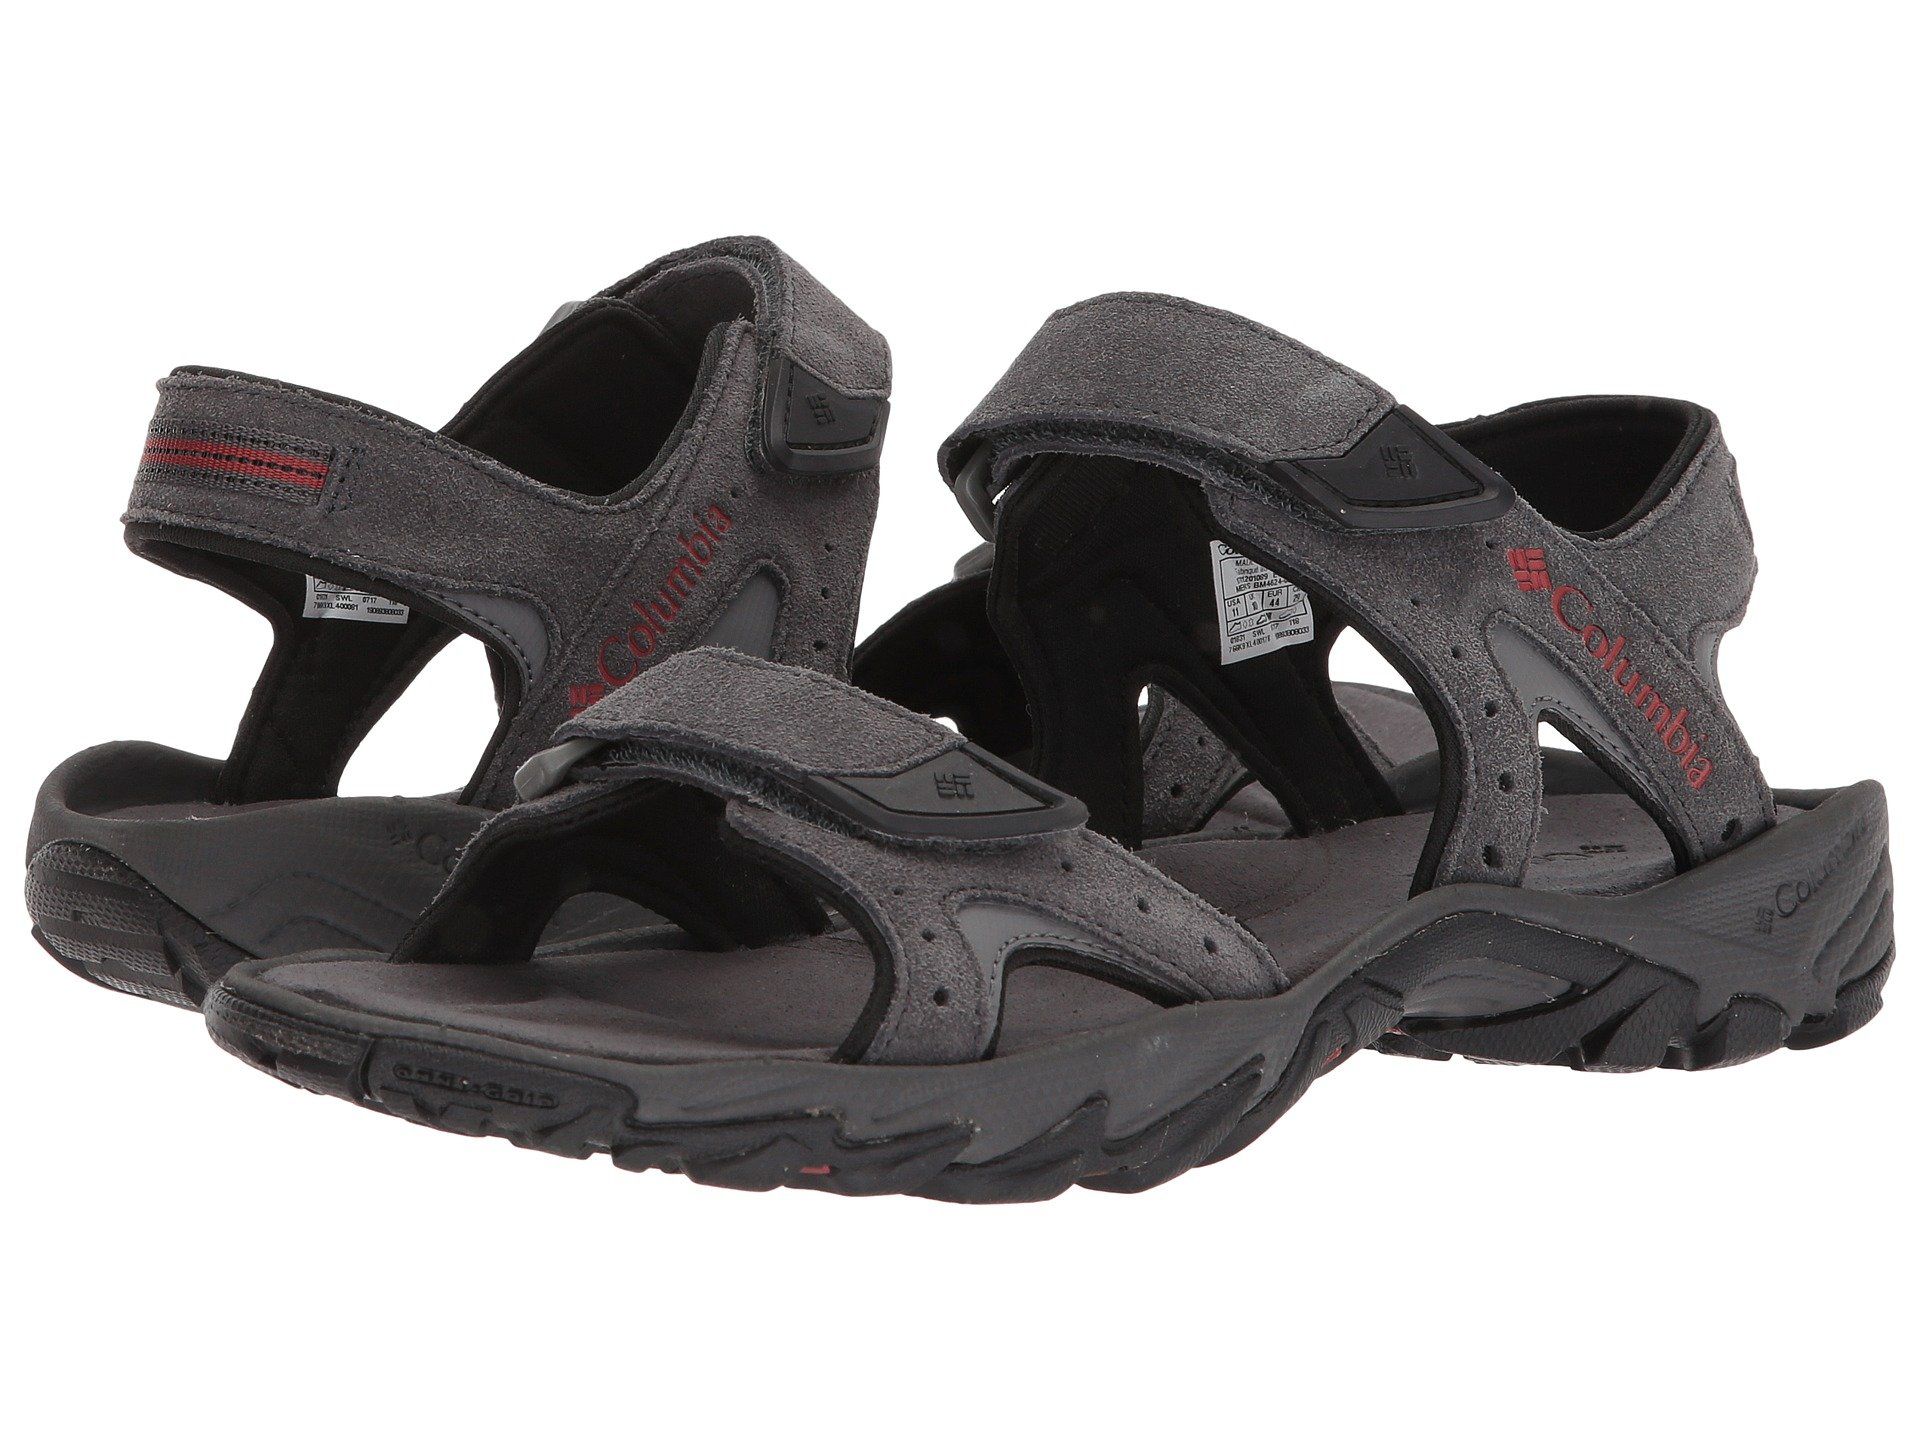 0e4570f90f3 Men s Columbia Sandals + FREE SHIPPING